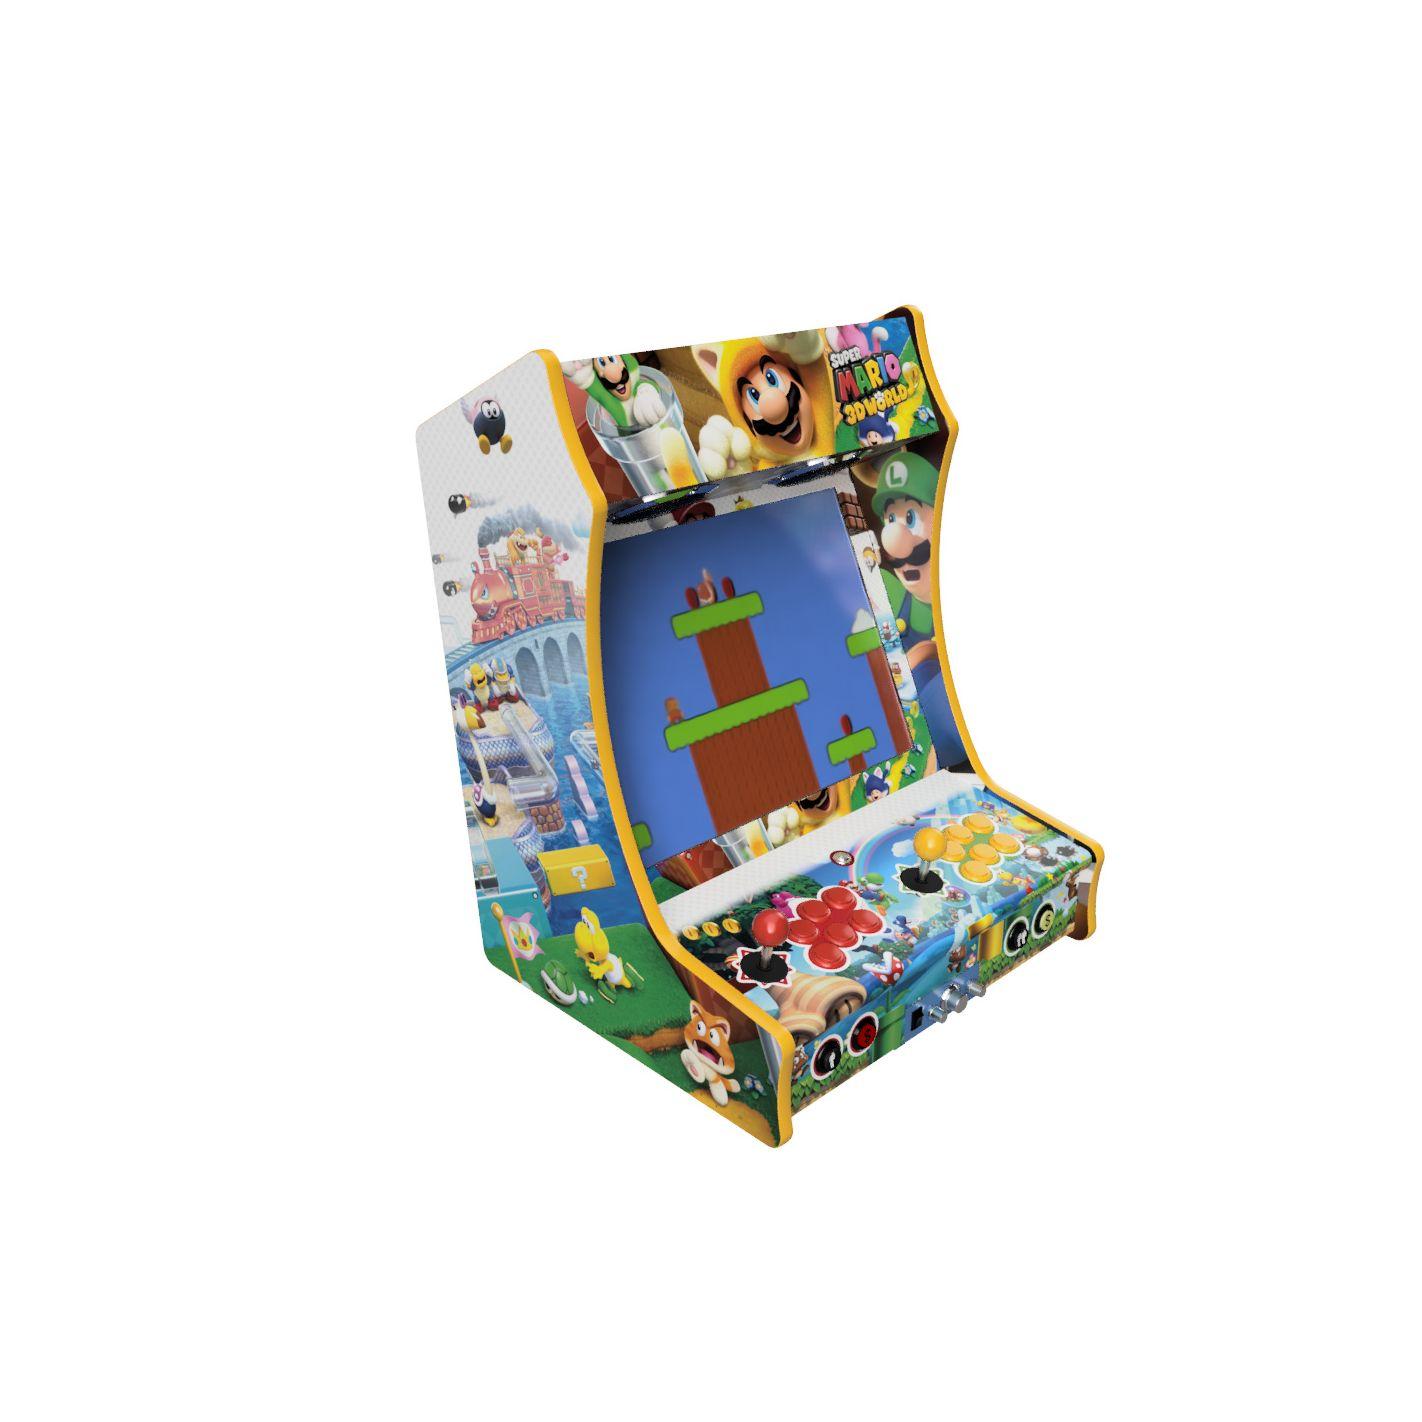 Vinyle Bartop Fabulous Arcade Classic Mario